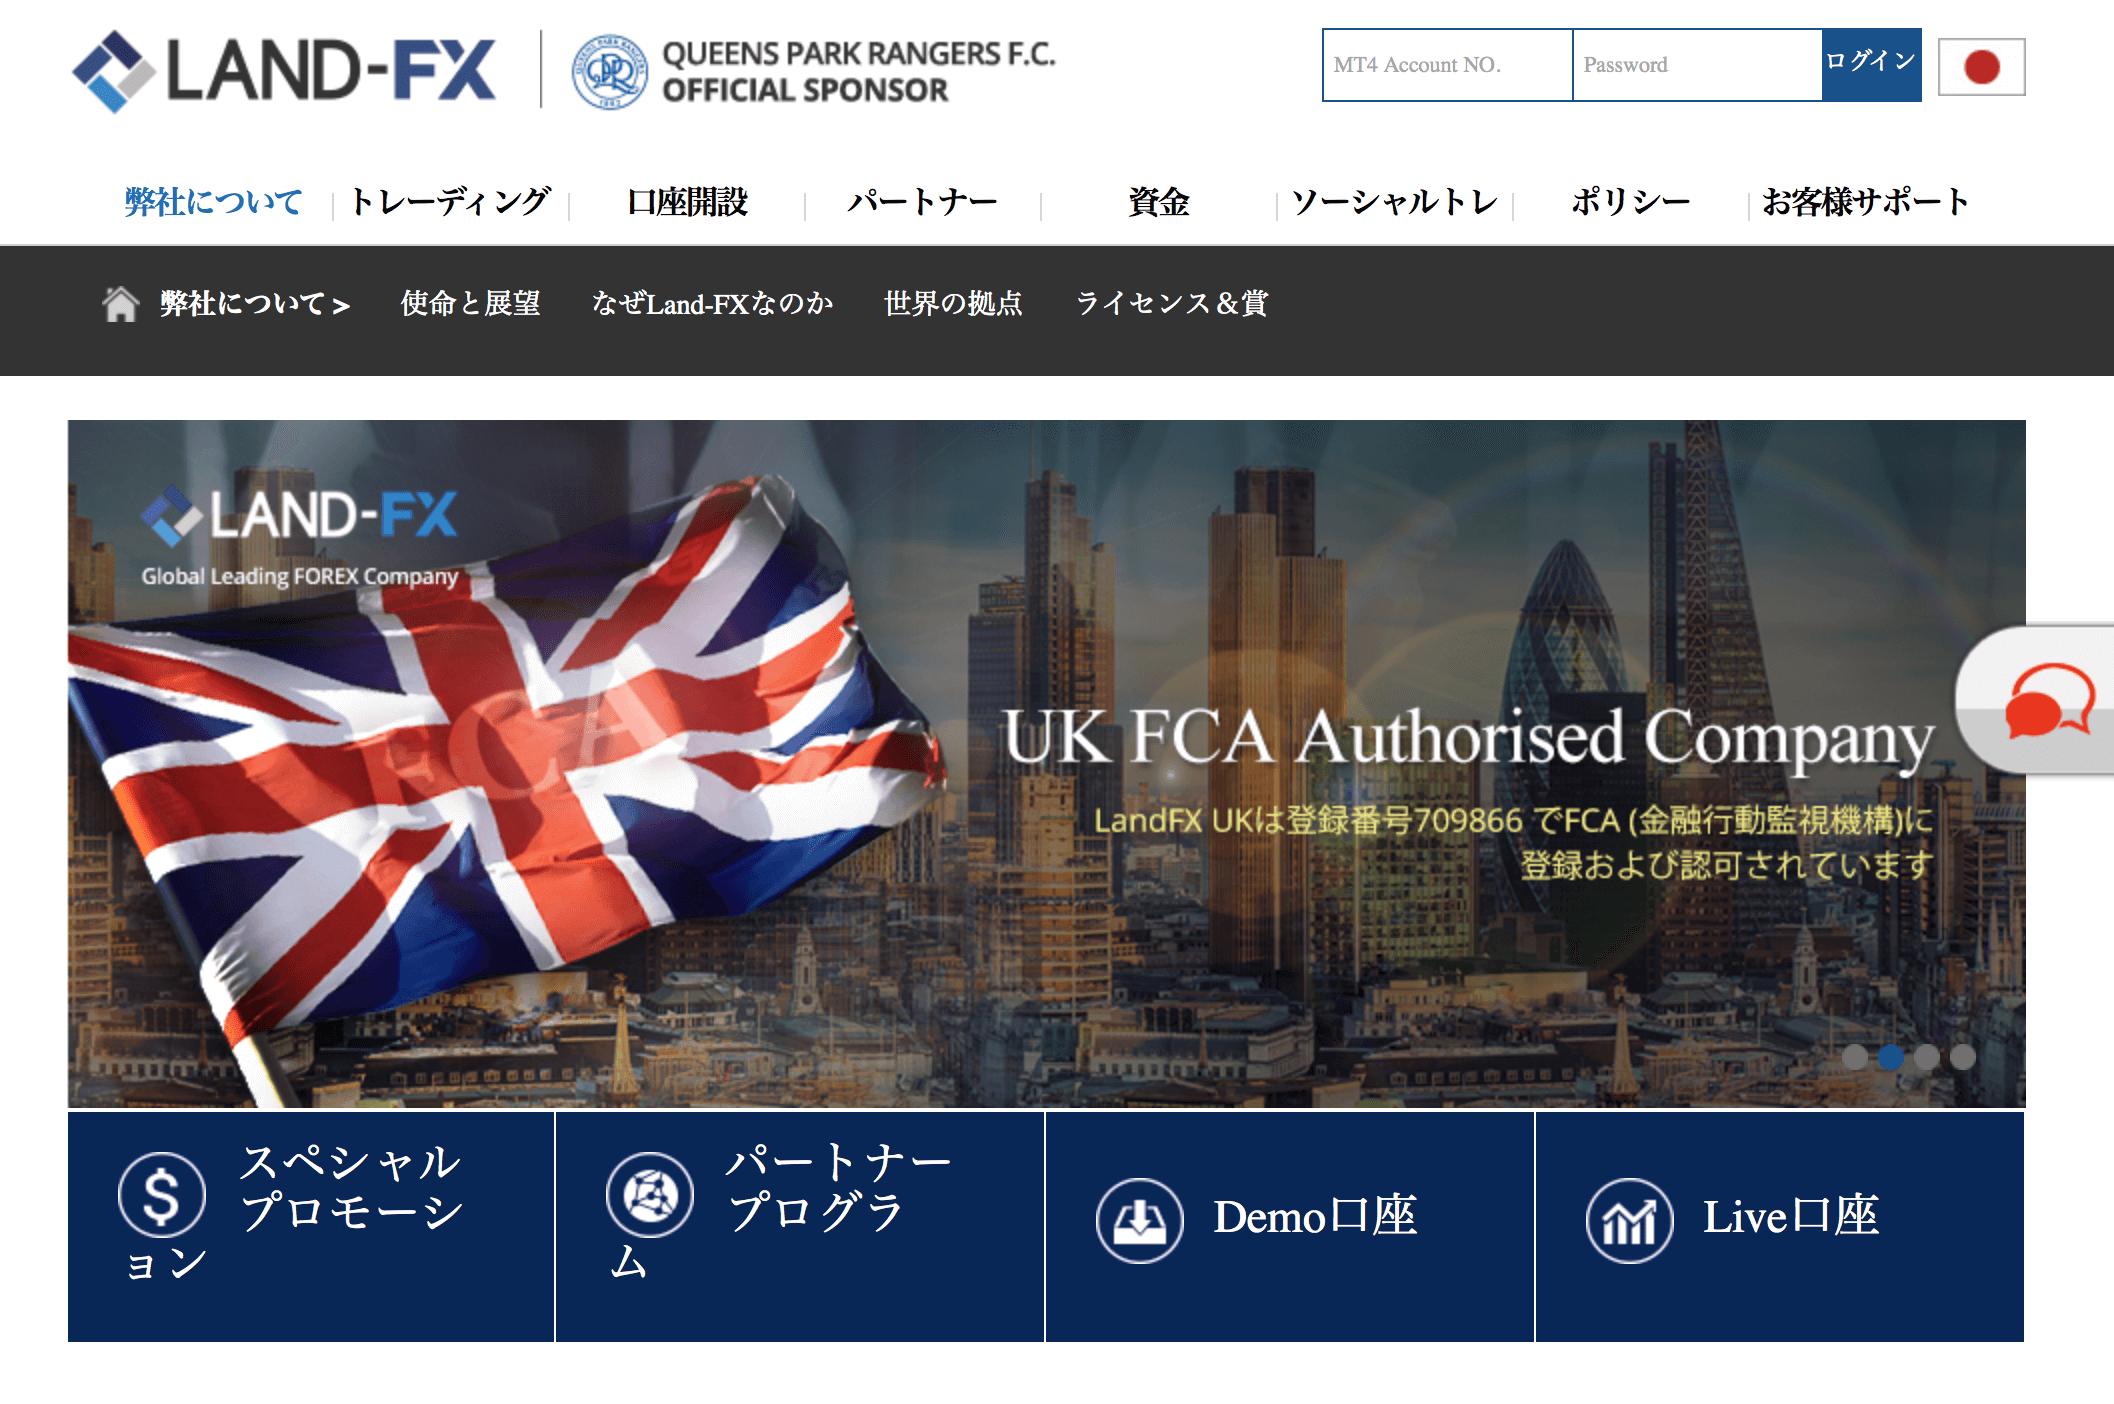 LAND FXの公式ページ